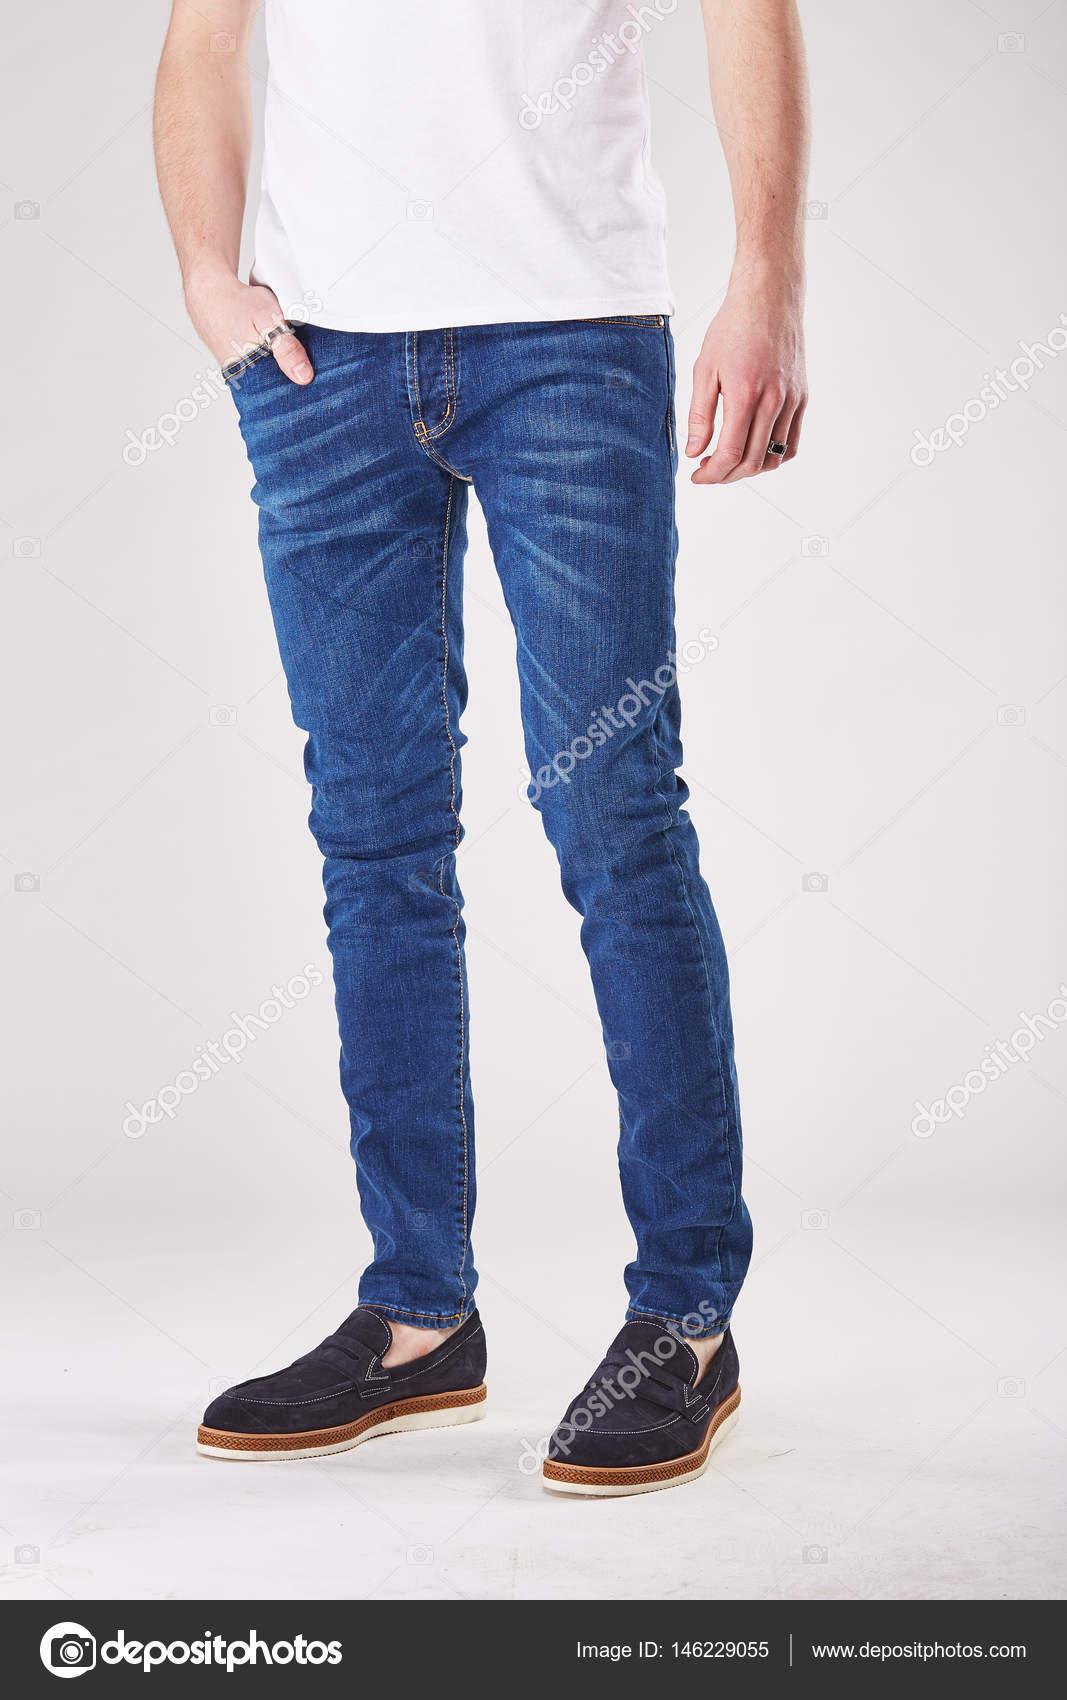 Pantalon Bleu Lumineux Des Homme Studio Pose Et En Mode kXwZTOPiu